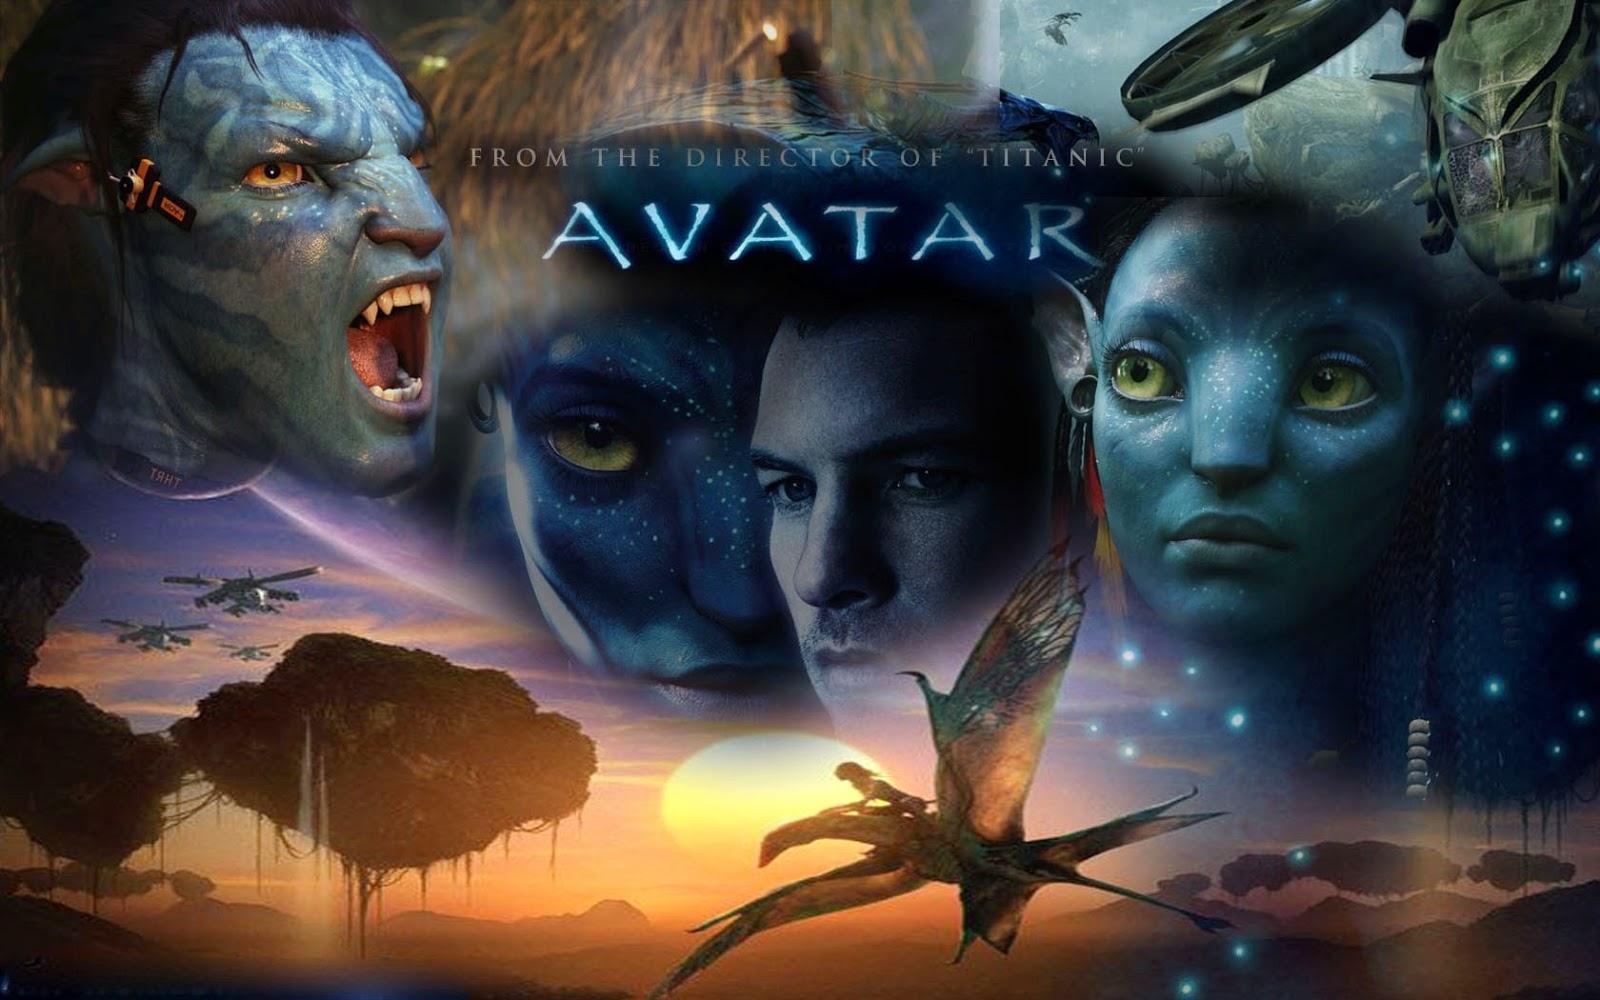 avatar 1080p 2009